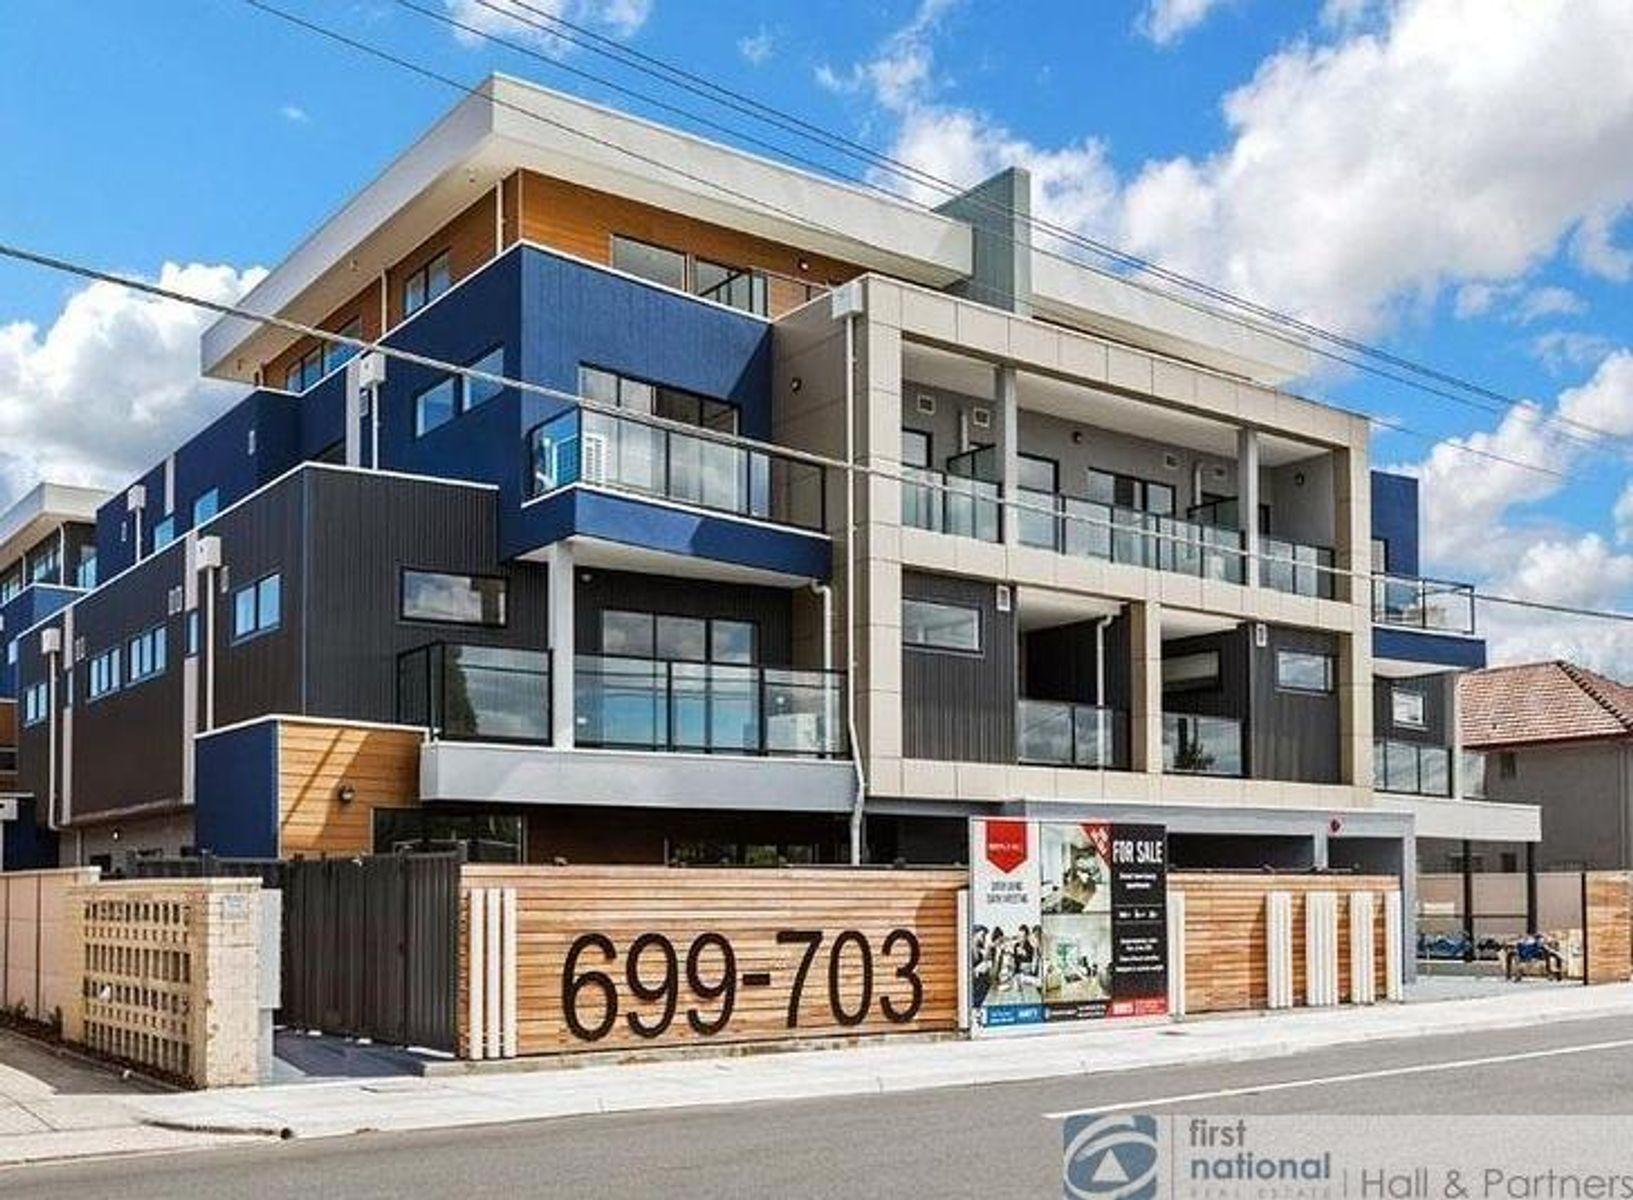 105/699 Barkly Street, West Footscray, VIC 3012